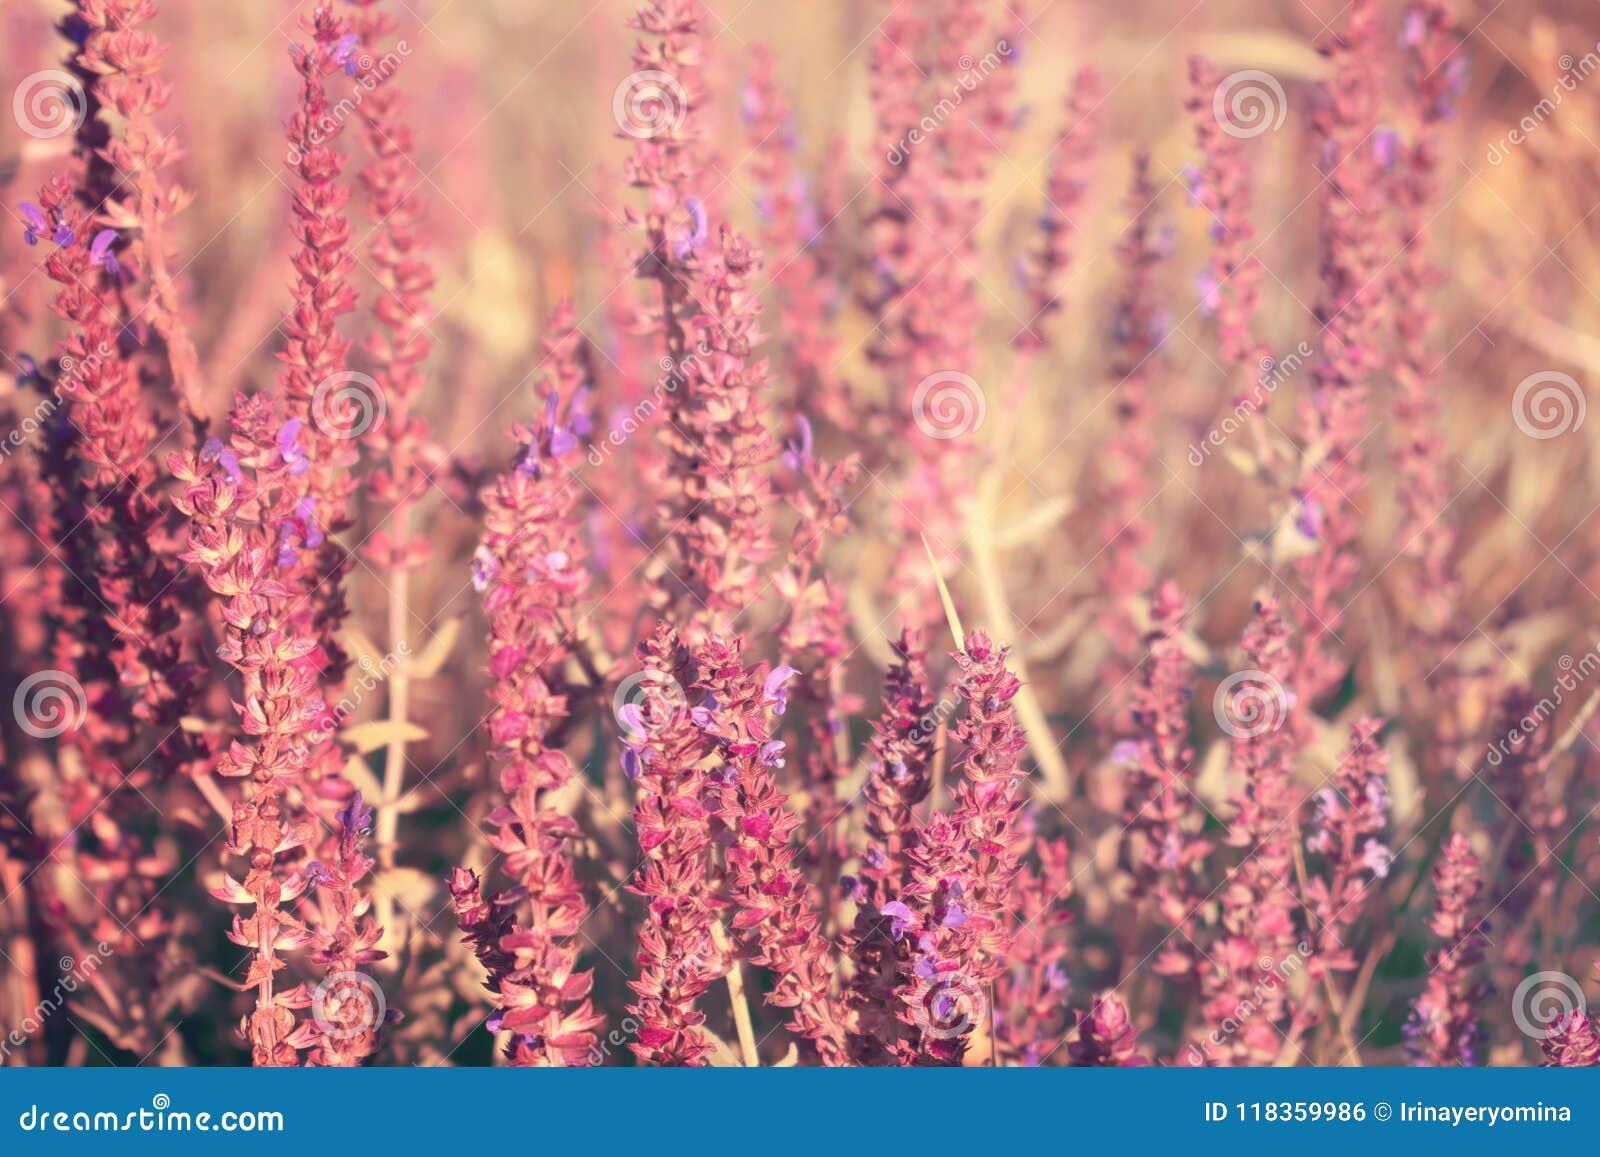 Blommande trädgårds- vis man (gemensam vis man, kulinarisk vis man), Salvia offici